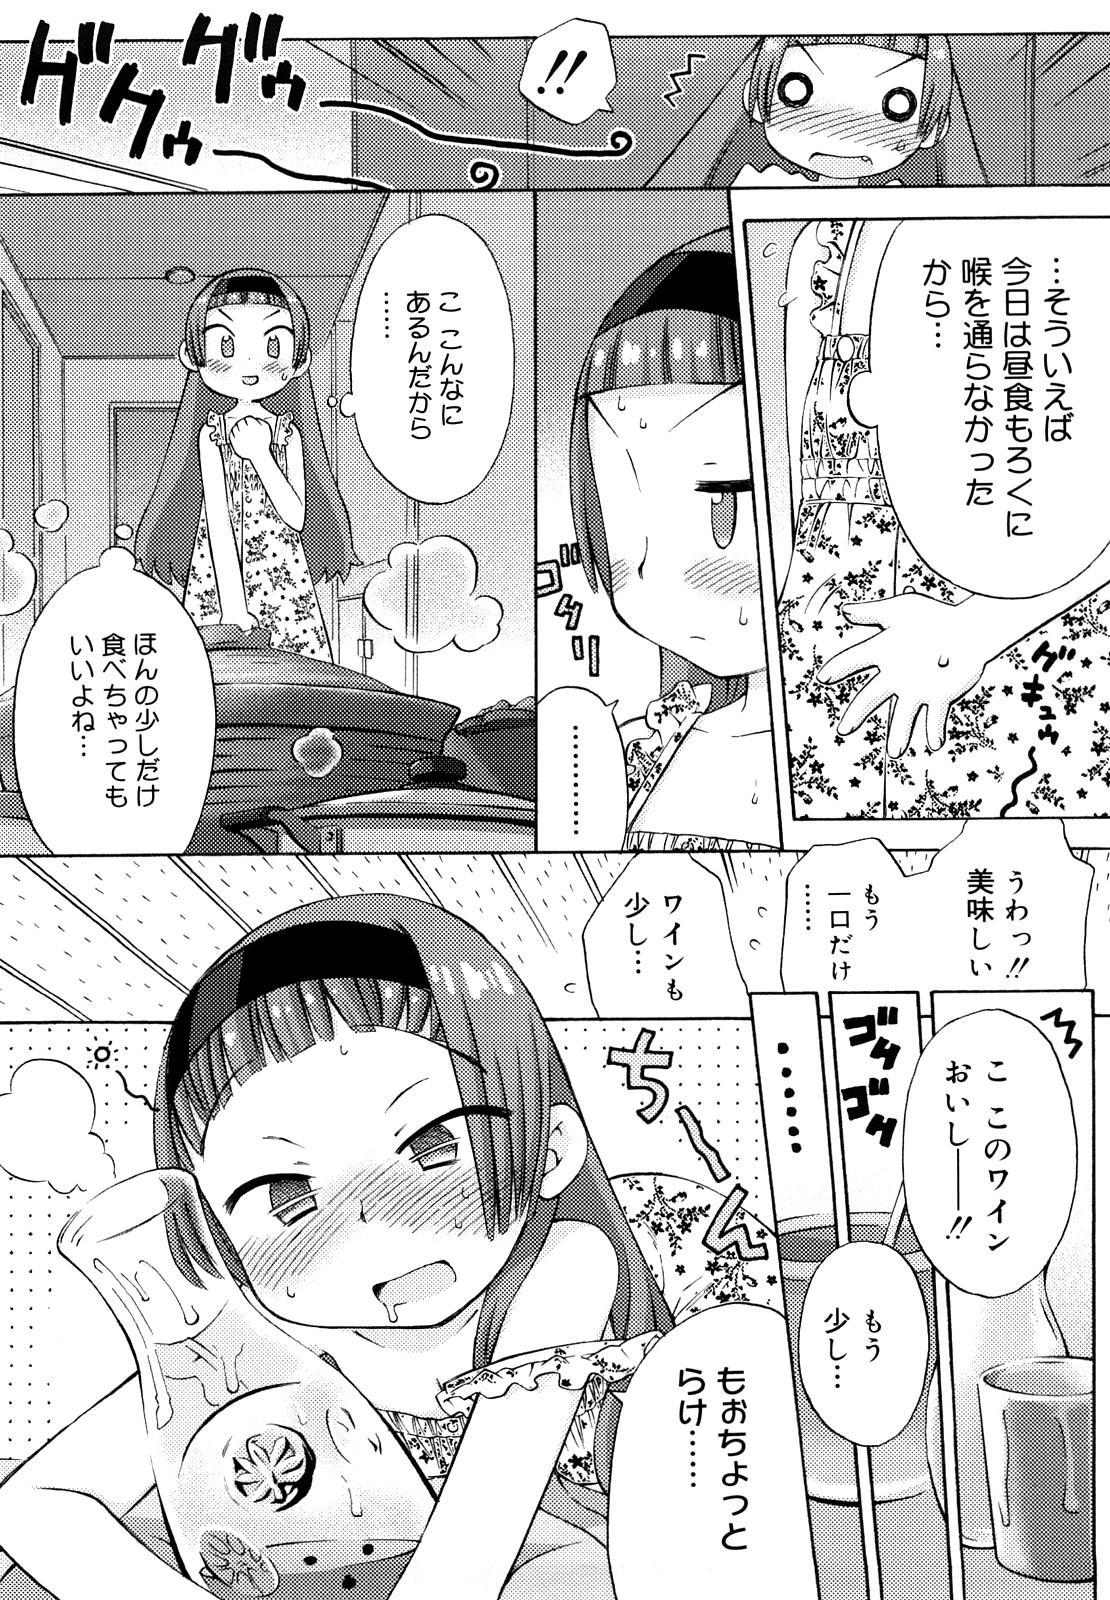 Hatsuden Pandakun! Shinsouban 52